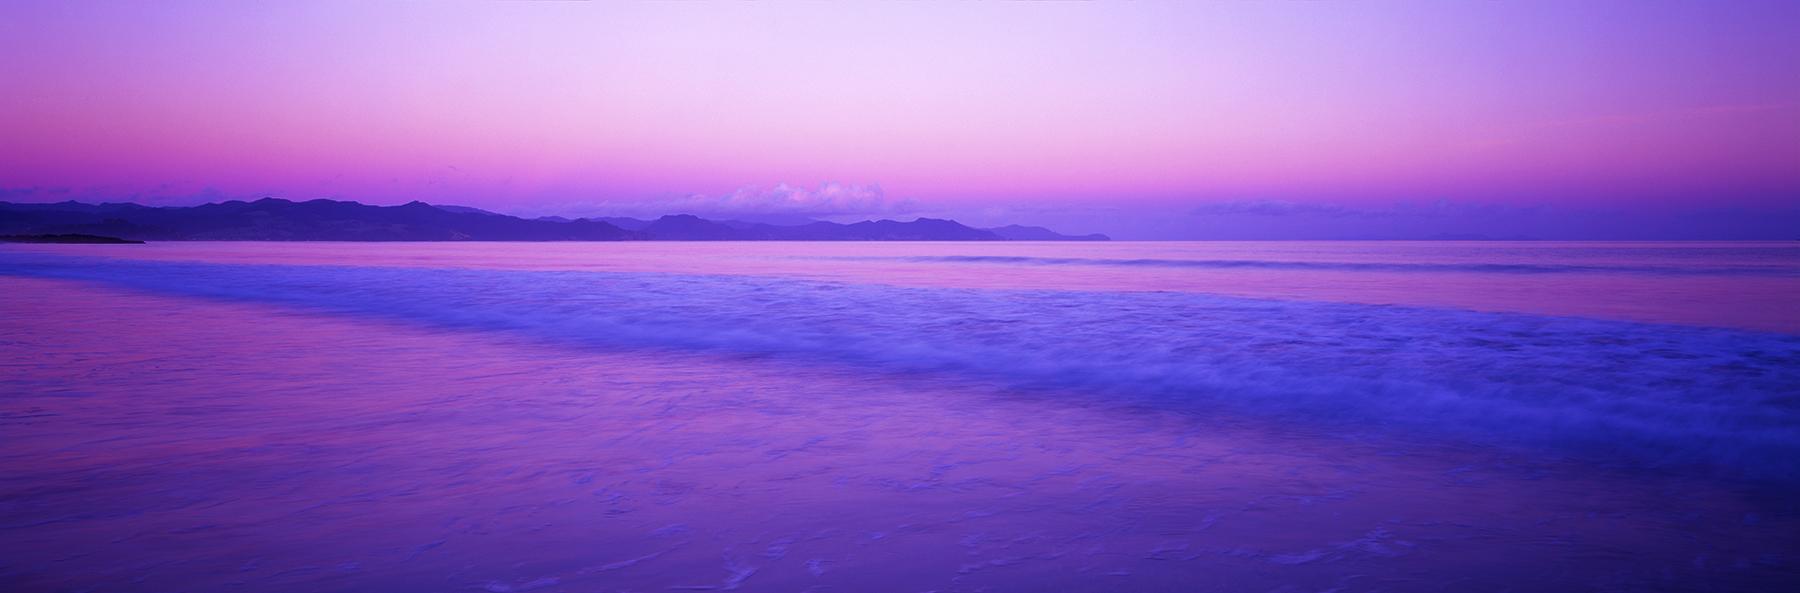 Coromandel Peninsula. A Limited Edition Fine Art Landscape Photograph by Richard Hume